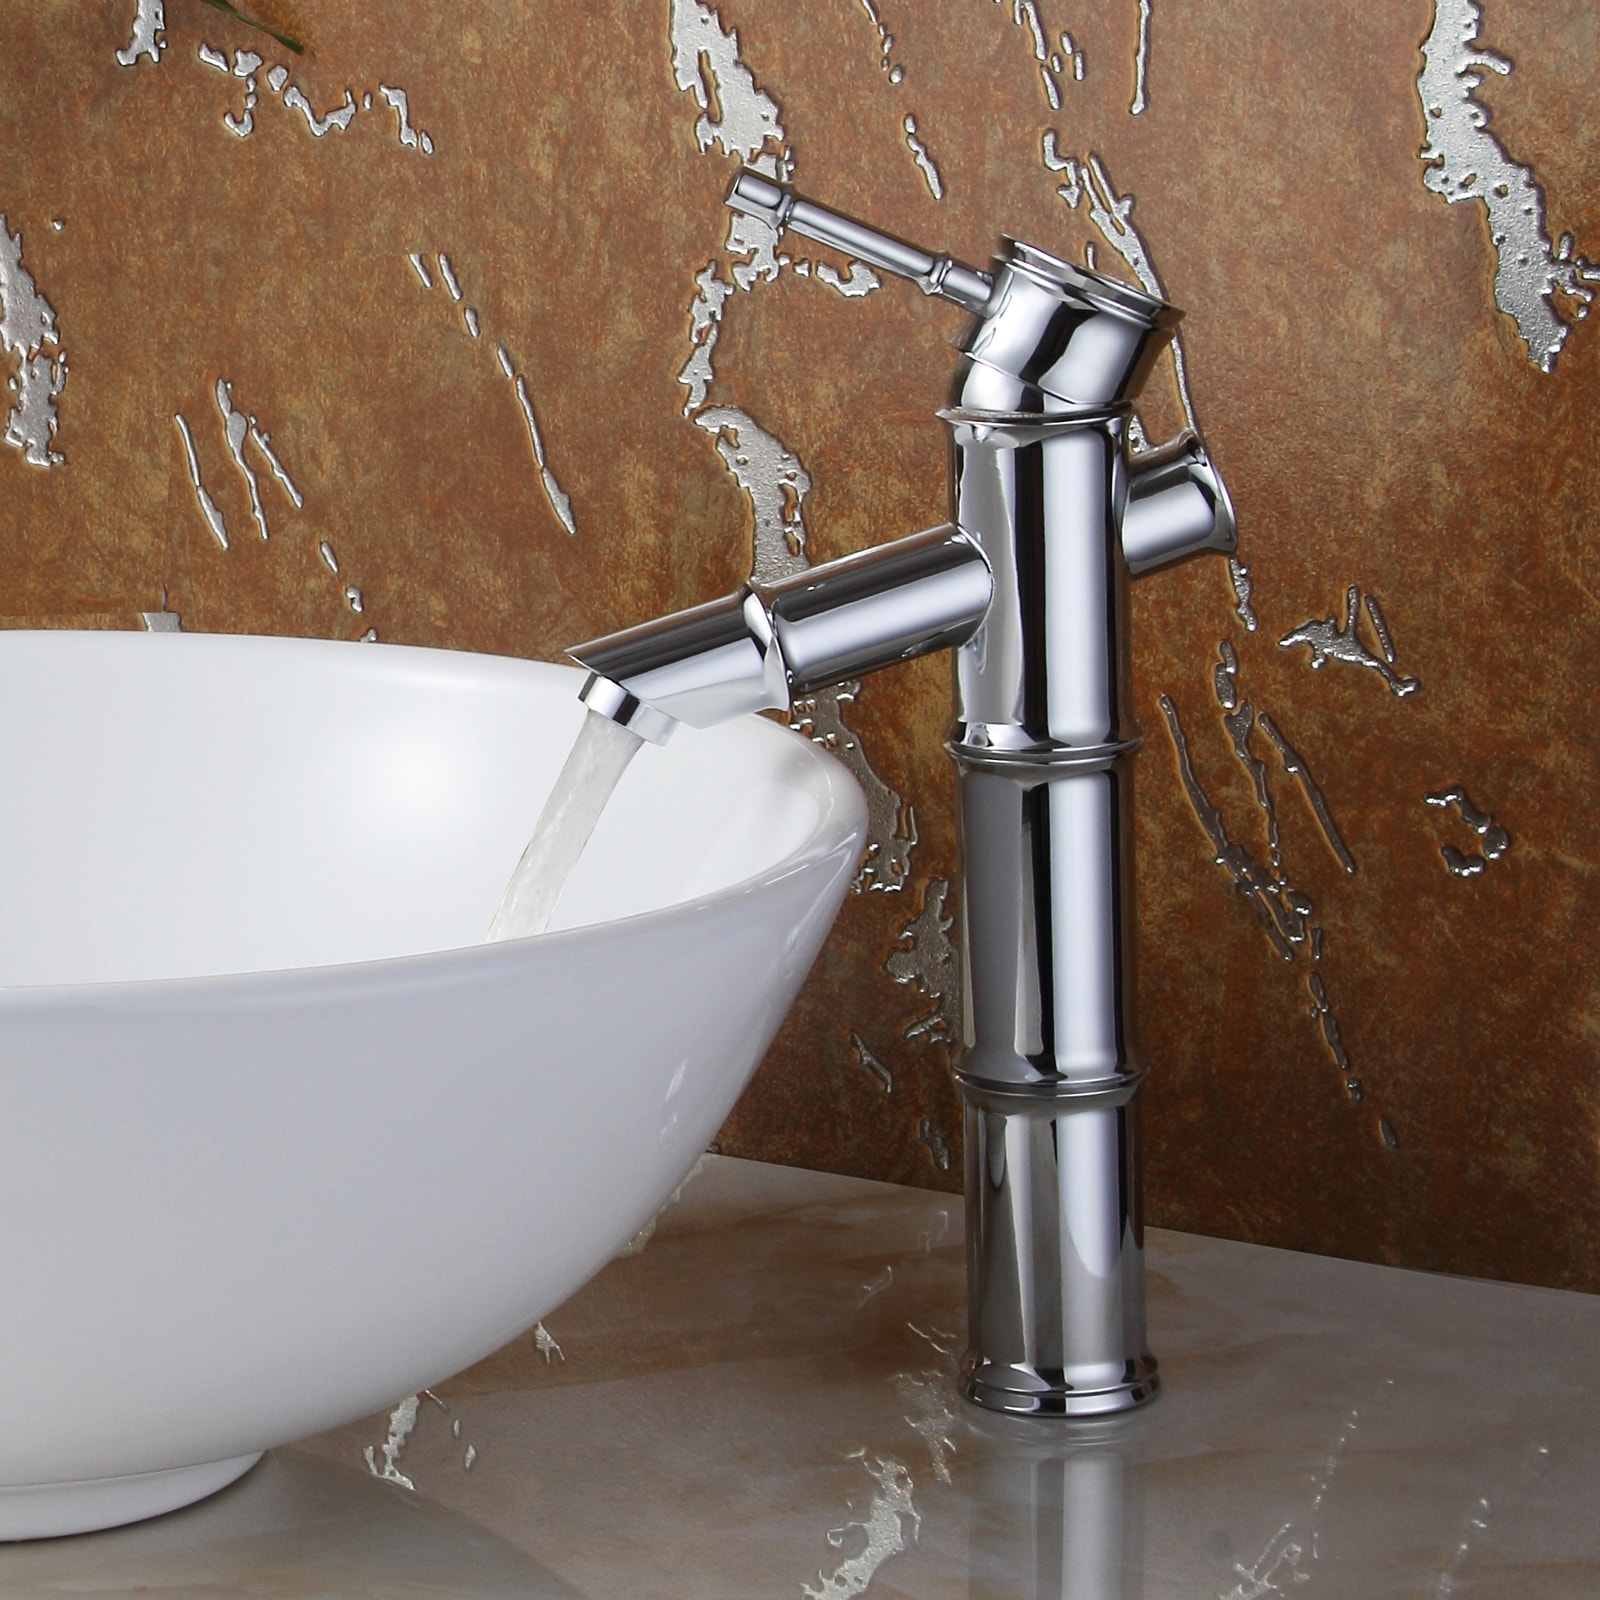 ELITE 882006 Single Handle Lever Lavatory Faucet - Free Shipping ...